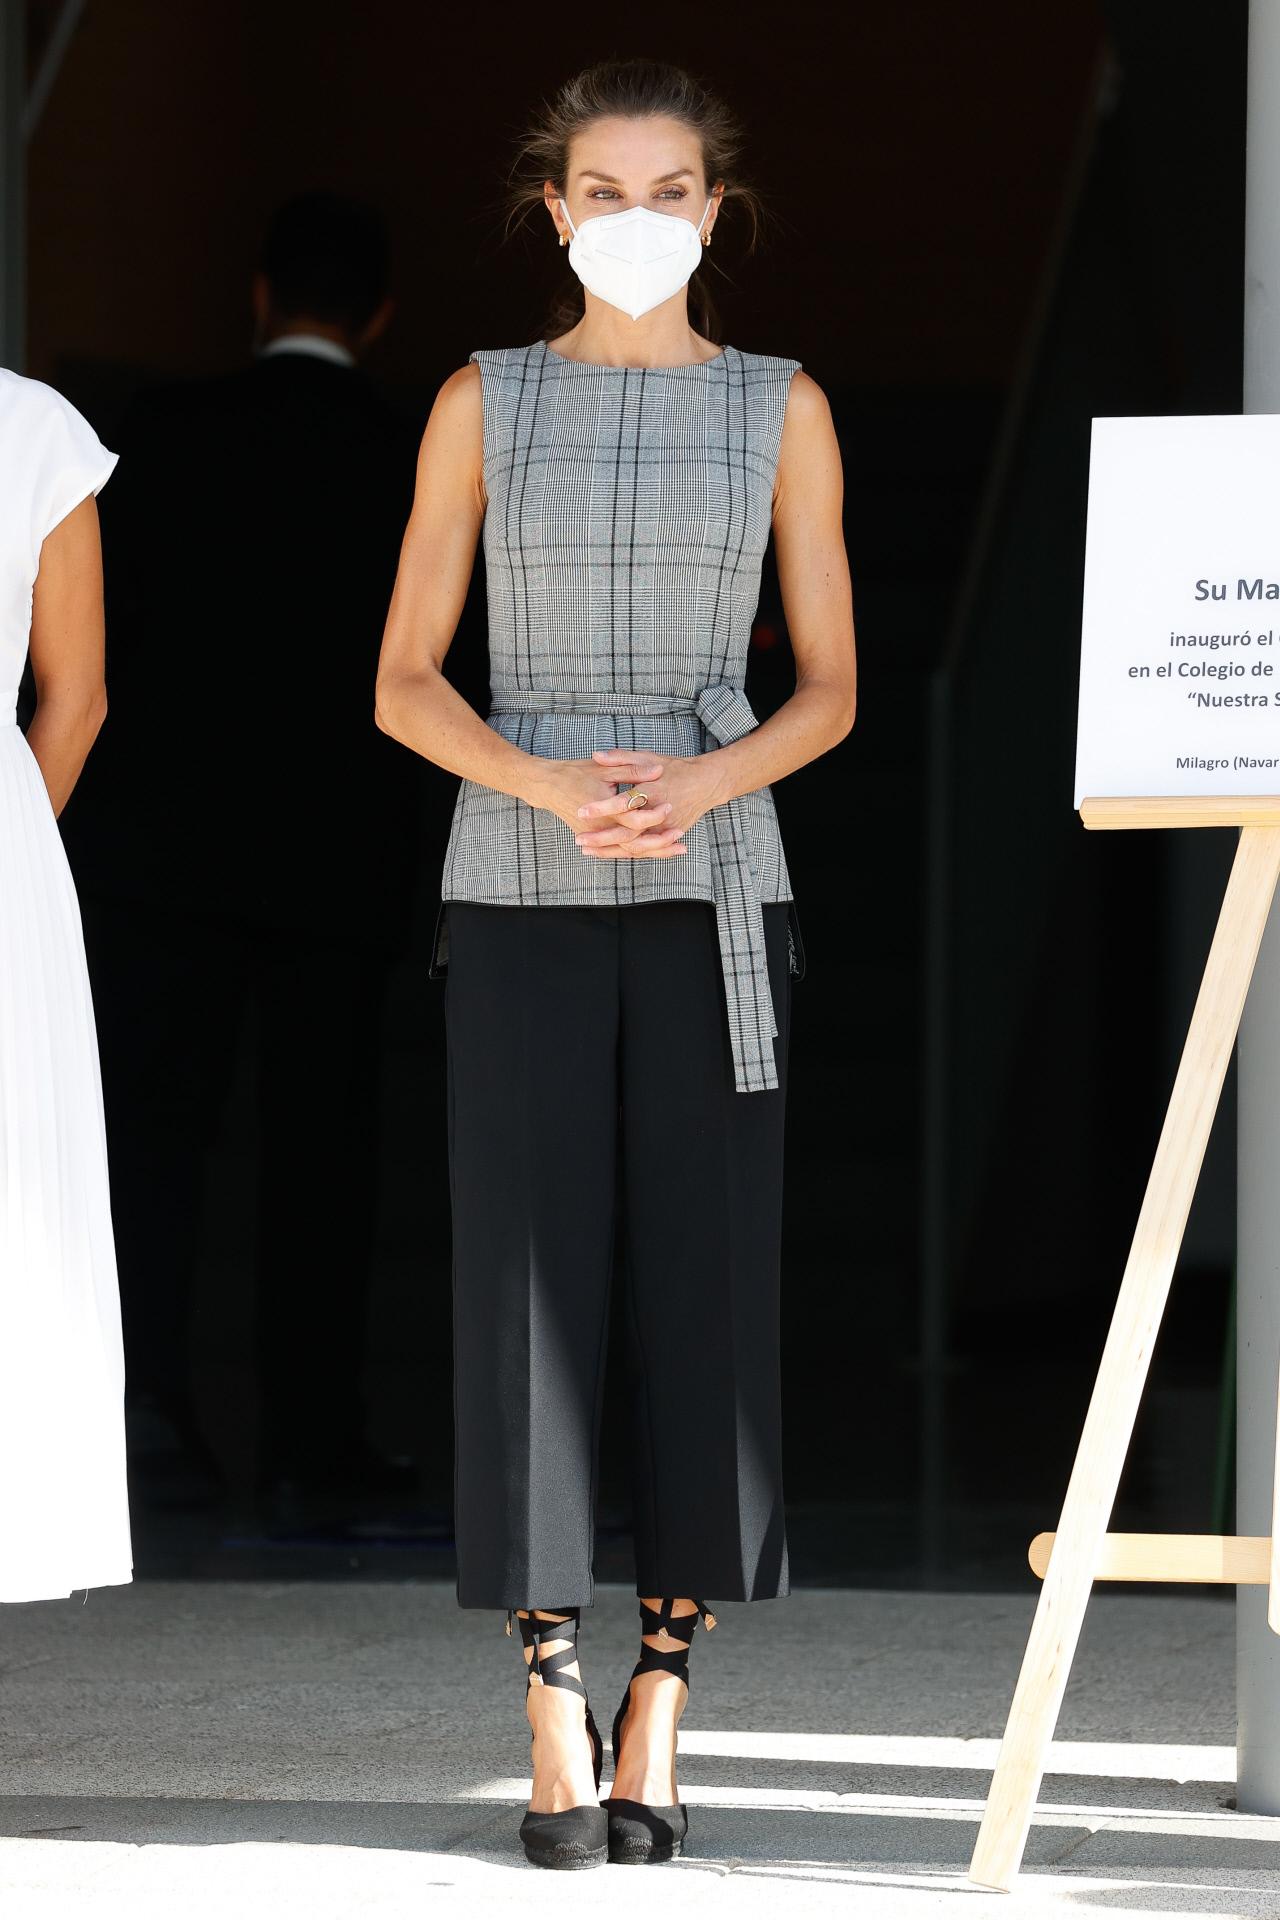 La reina Letizia inaugura el curso escolar.